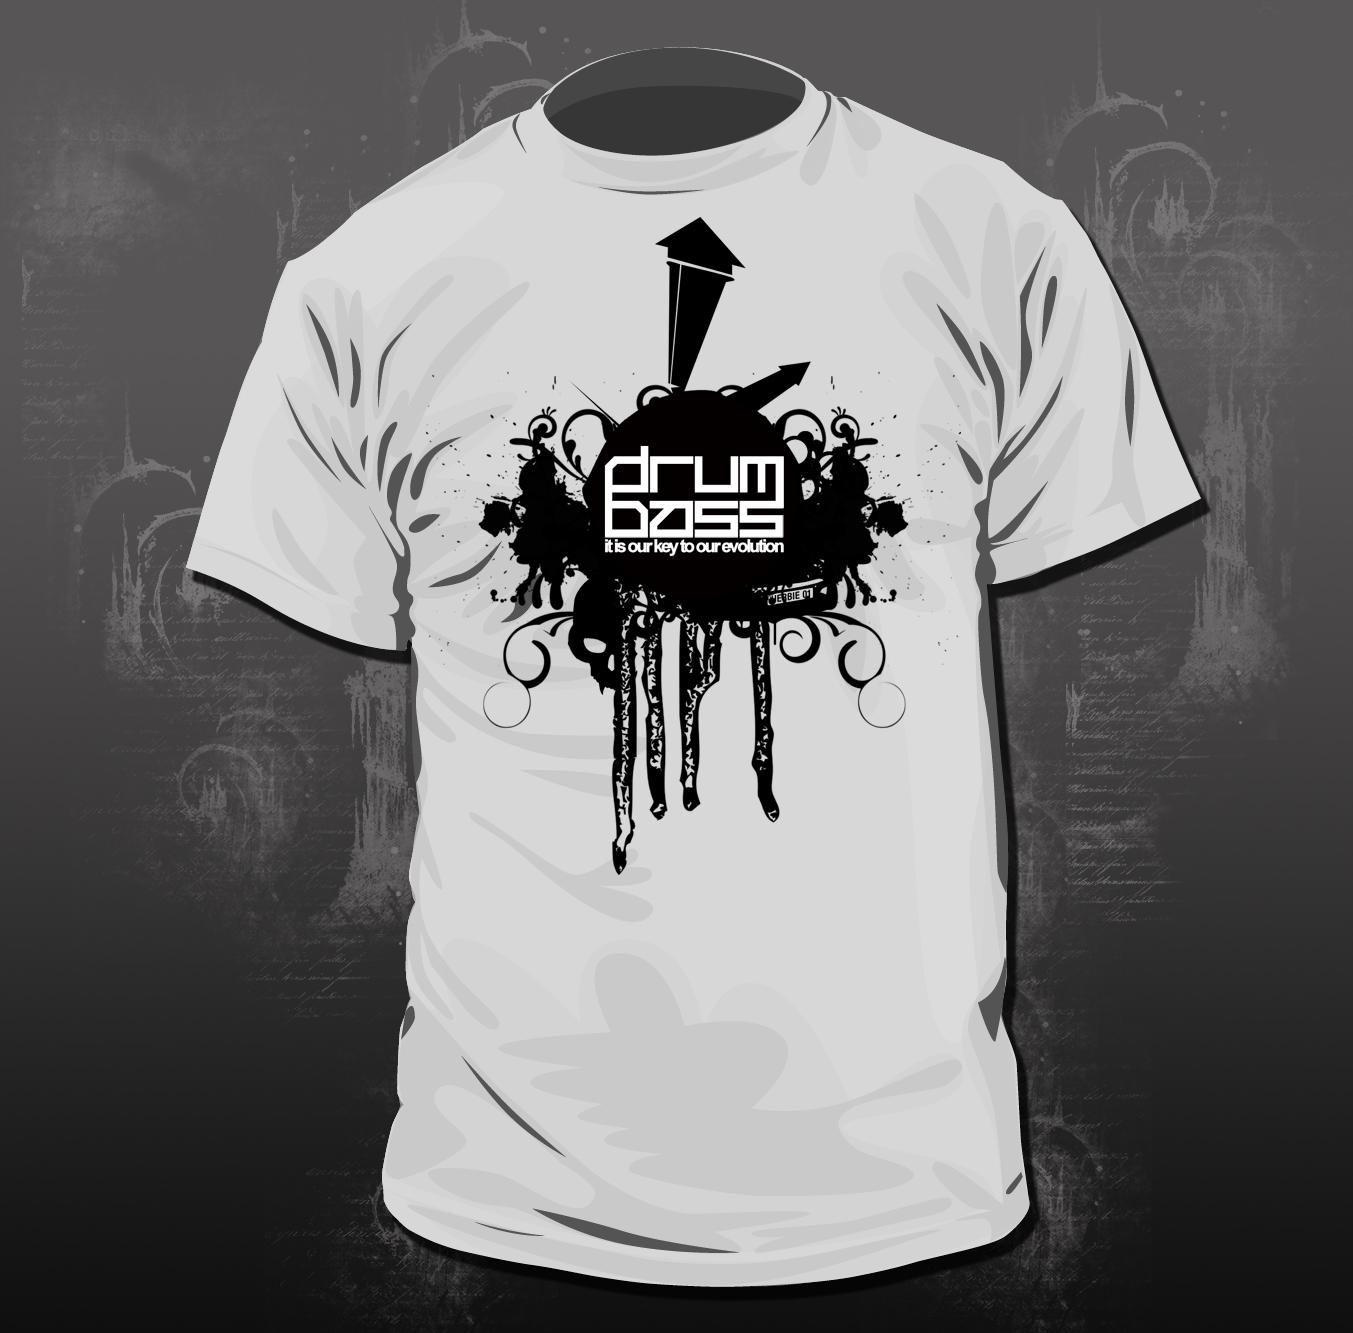 b7ba7ab4cc54 t-shirt-printing-design.html in hitizexyt.github.com